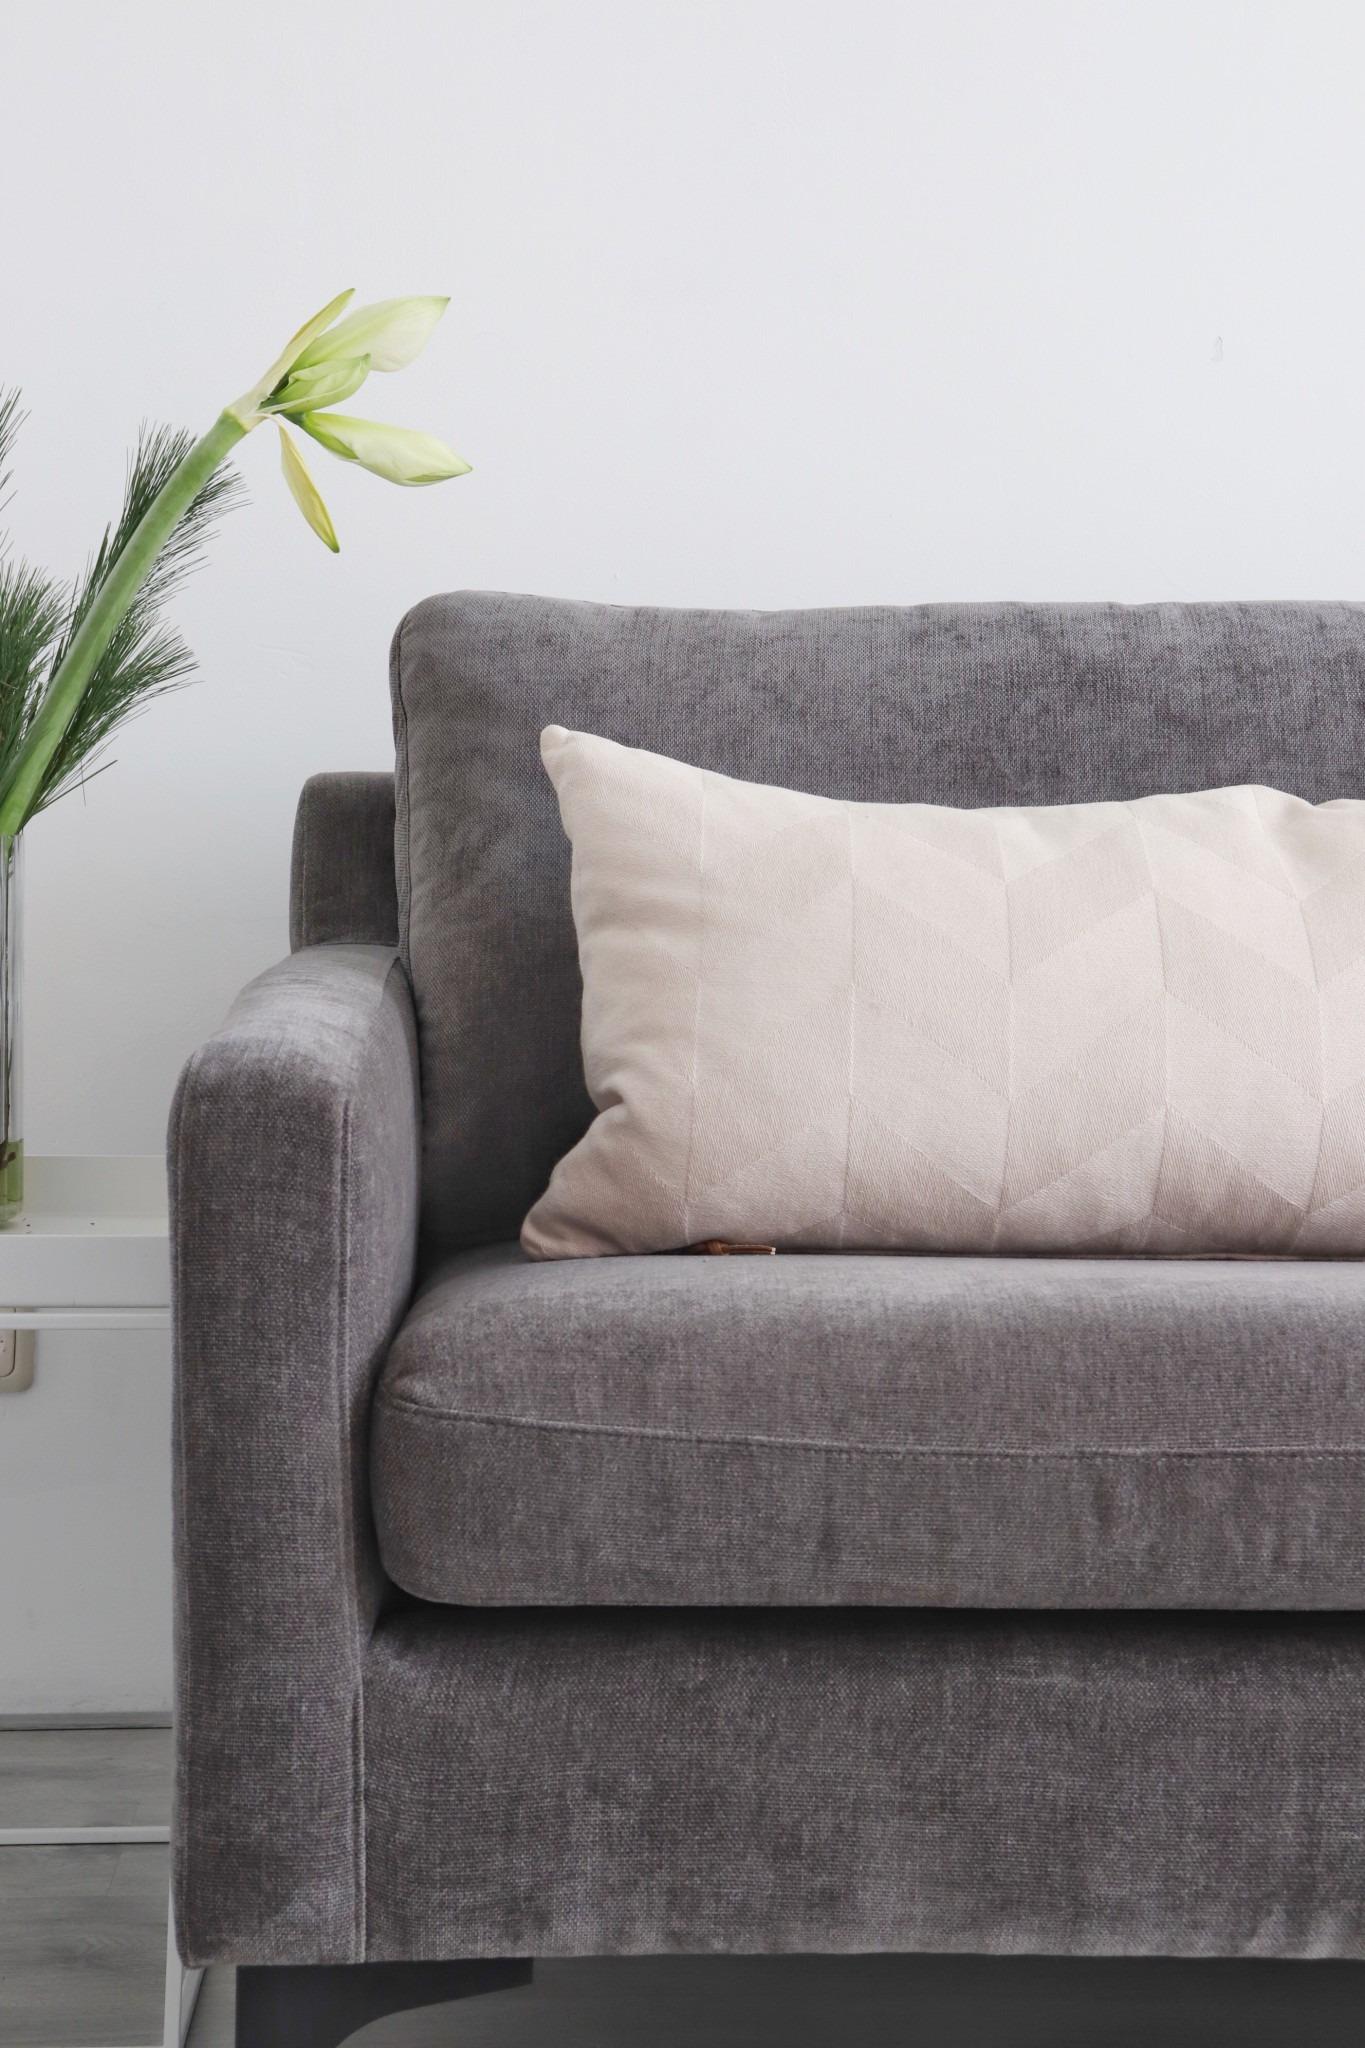 Sofacompany bank Ashta in Dannu Steel Grey